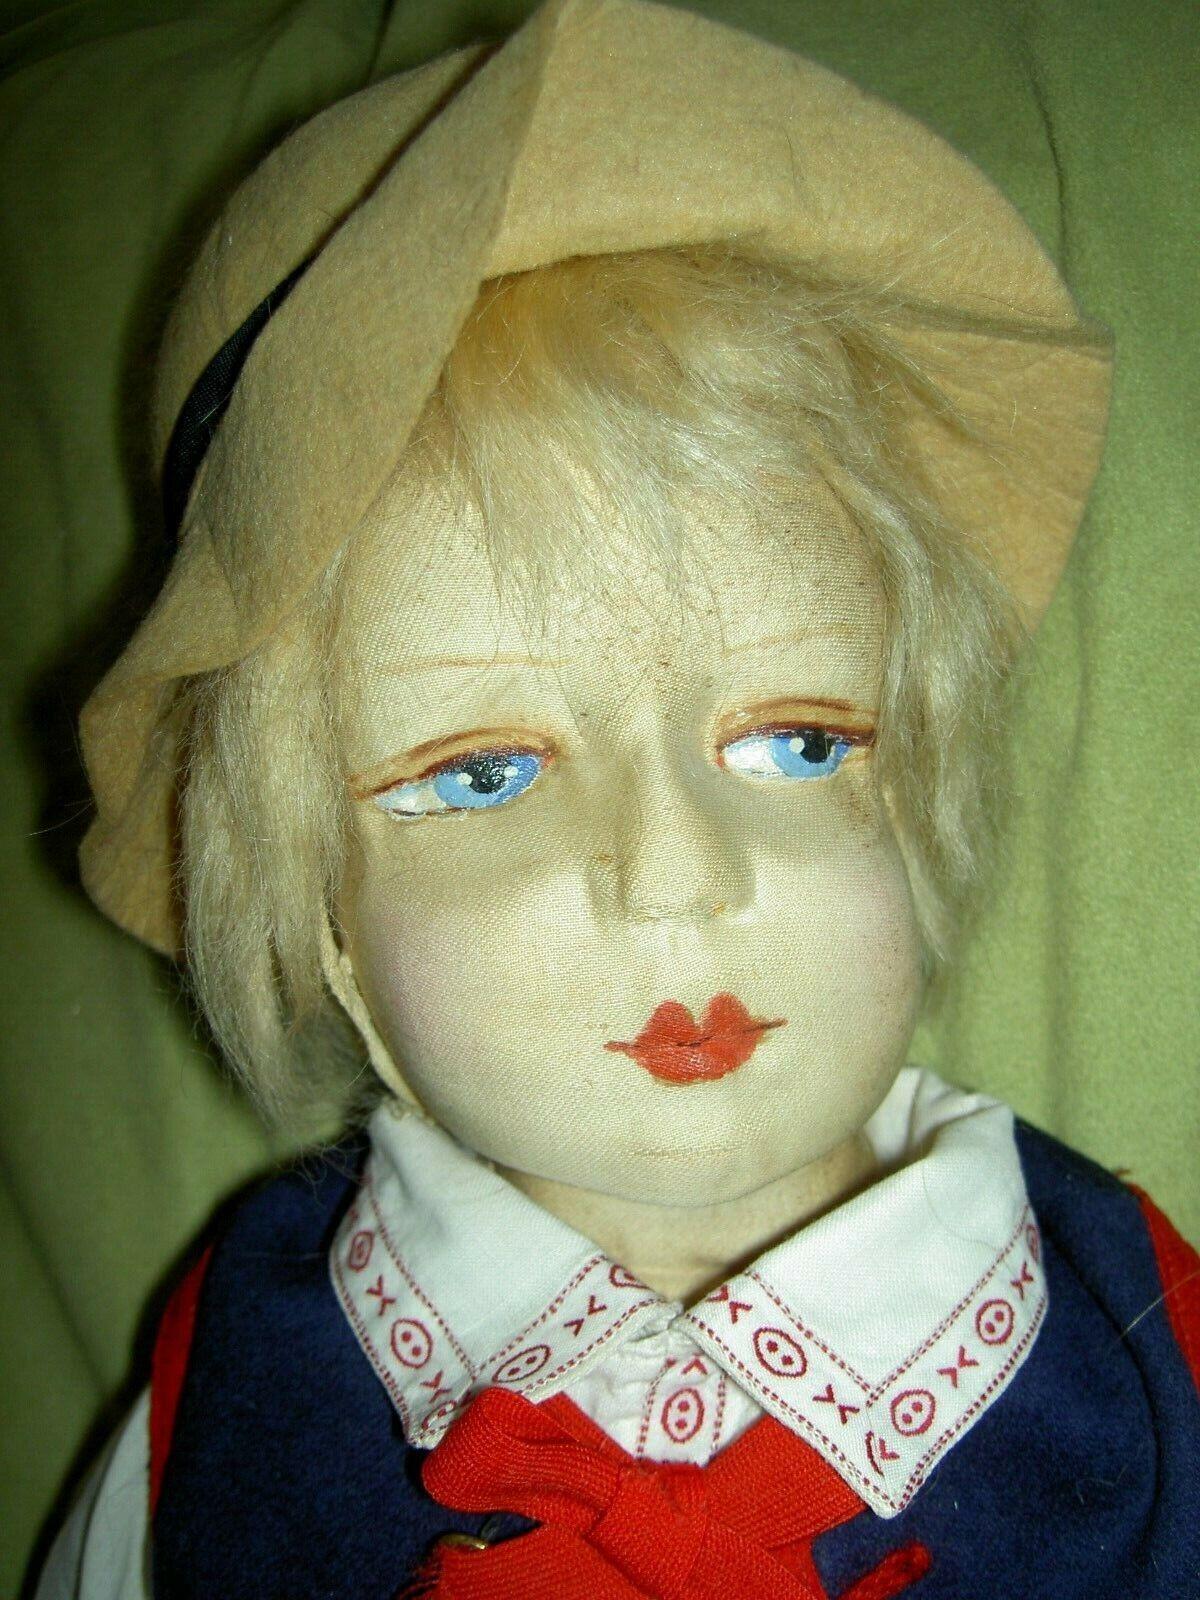 Very RARE, Gerling antique cloth, male boudoir bed bambola  c1927 great outfit XLNT  risparmia fino al 70% di sconto